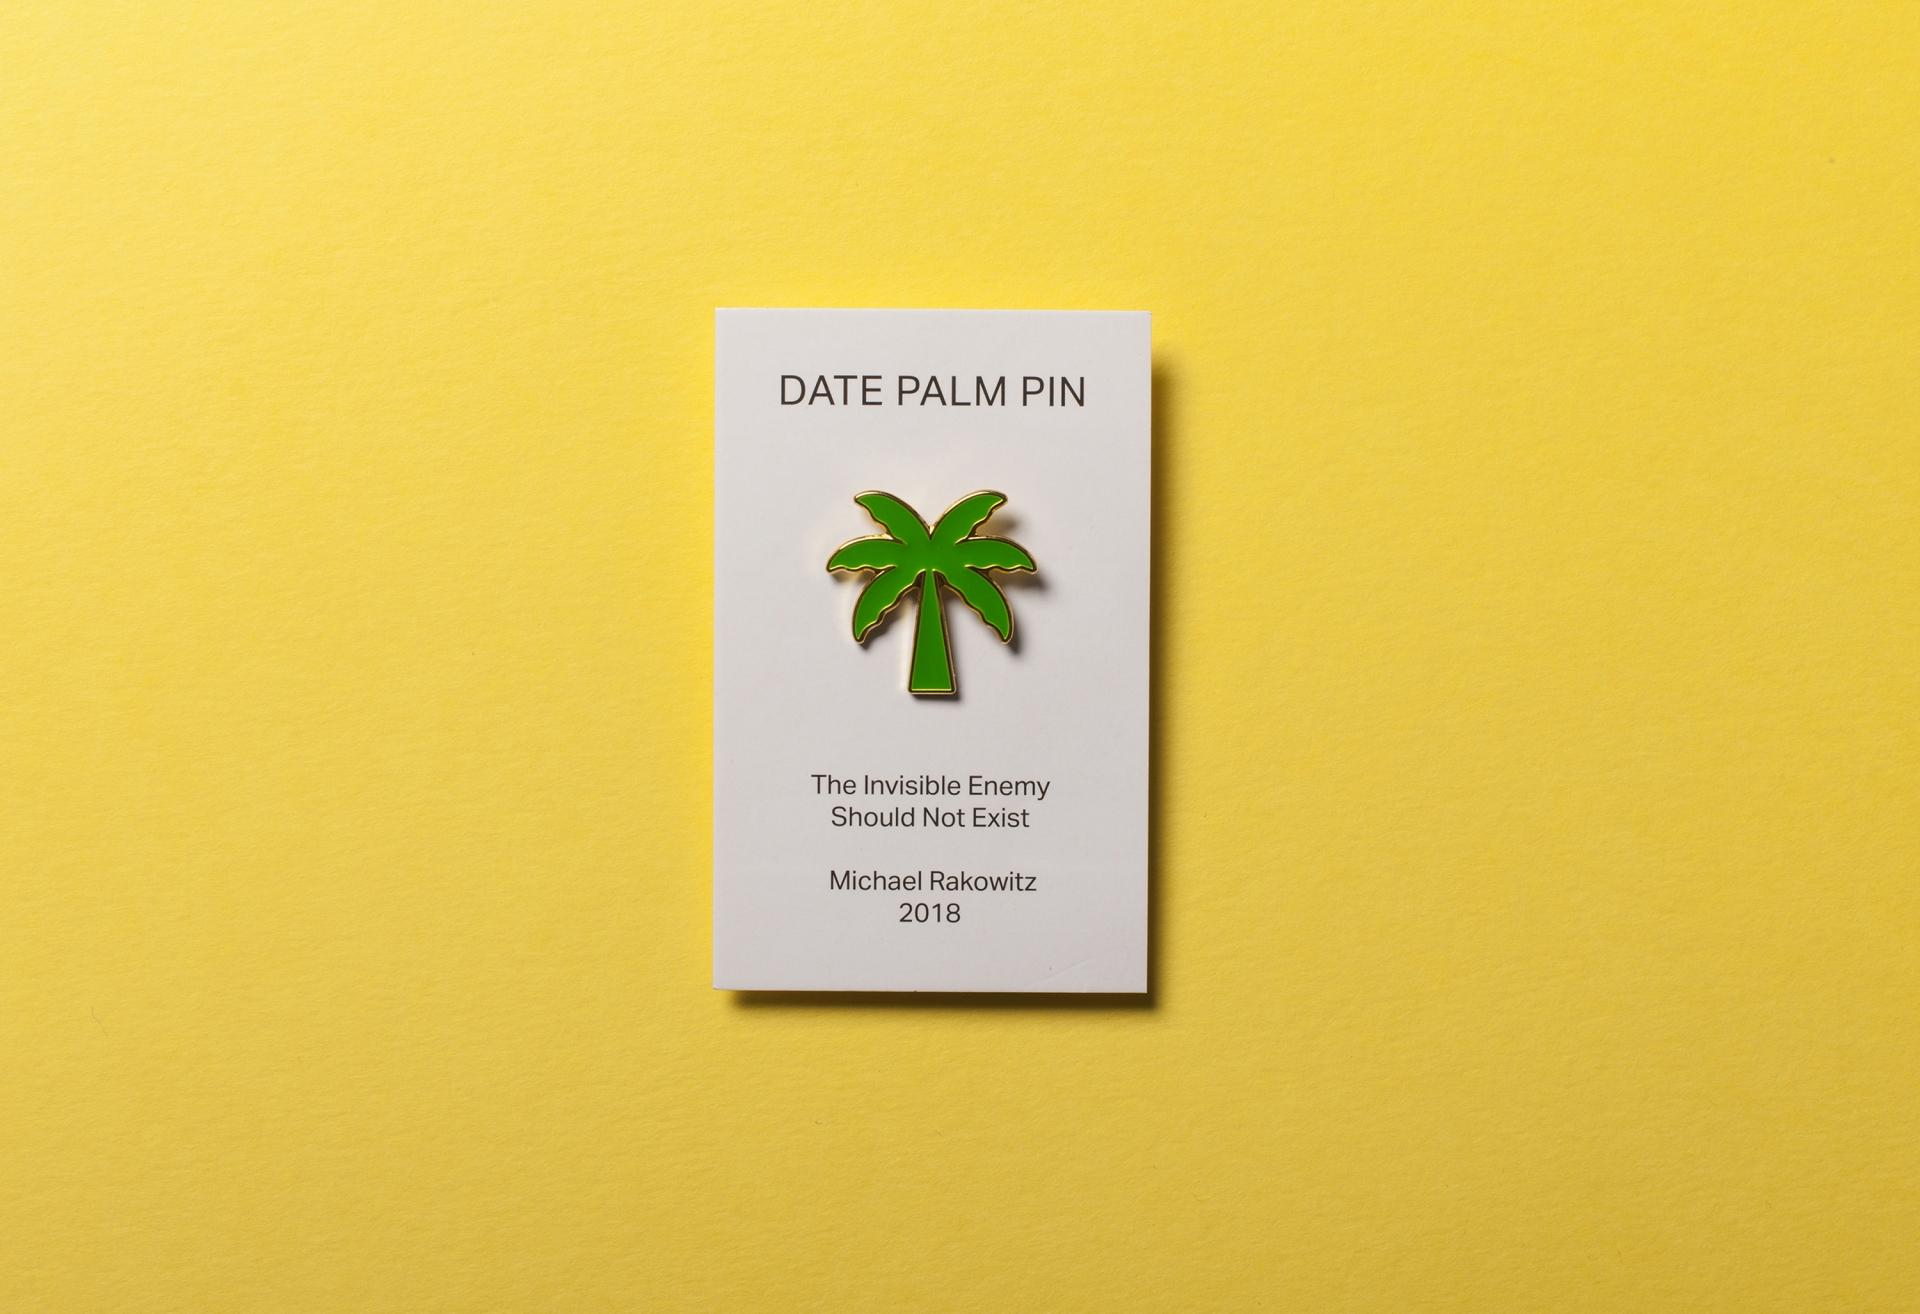 Patrick Fry Studio Michael Rakowitz — A House With A Date Palm